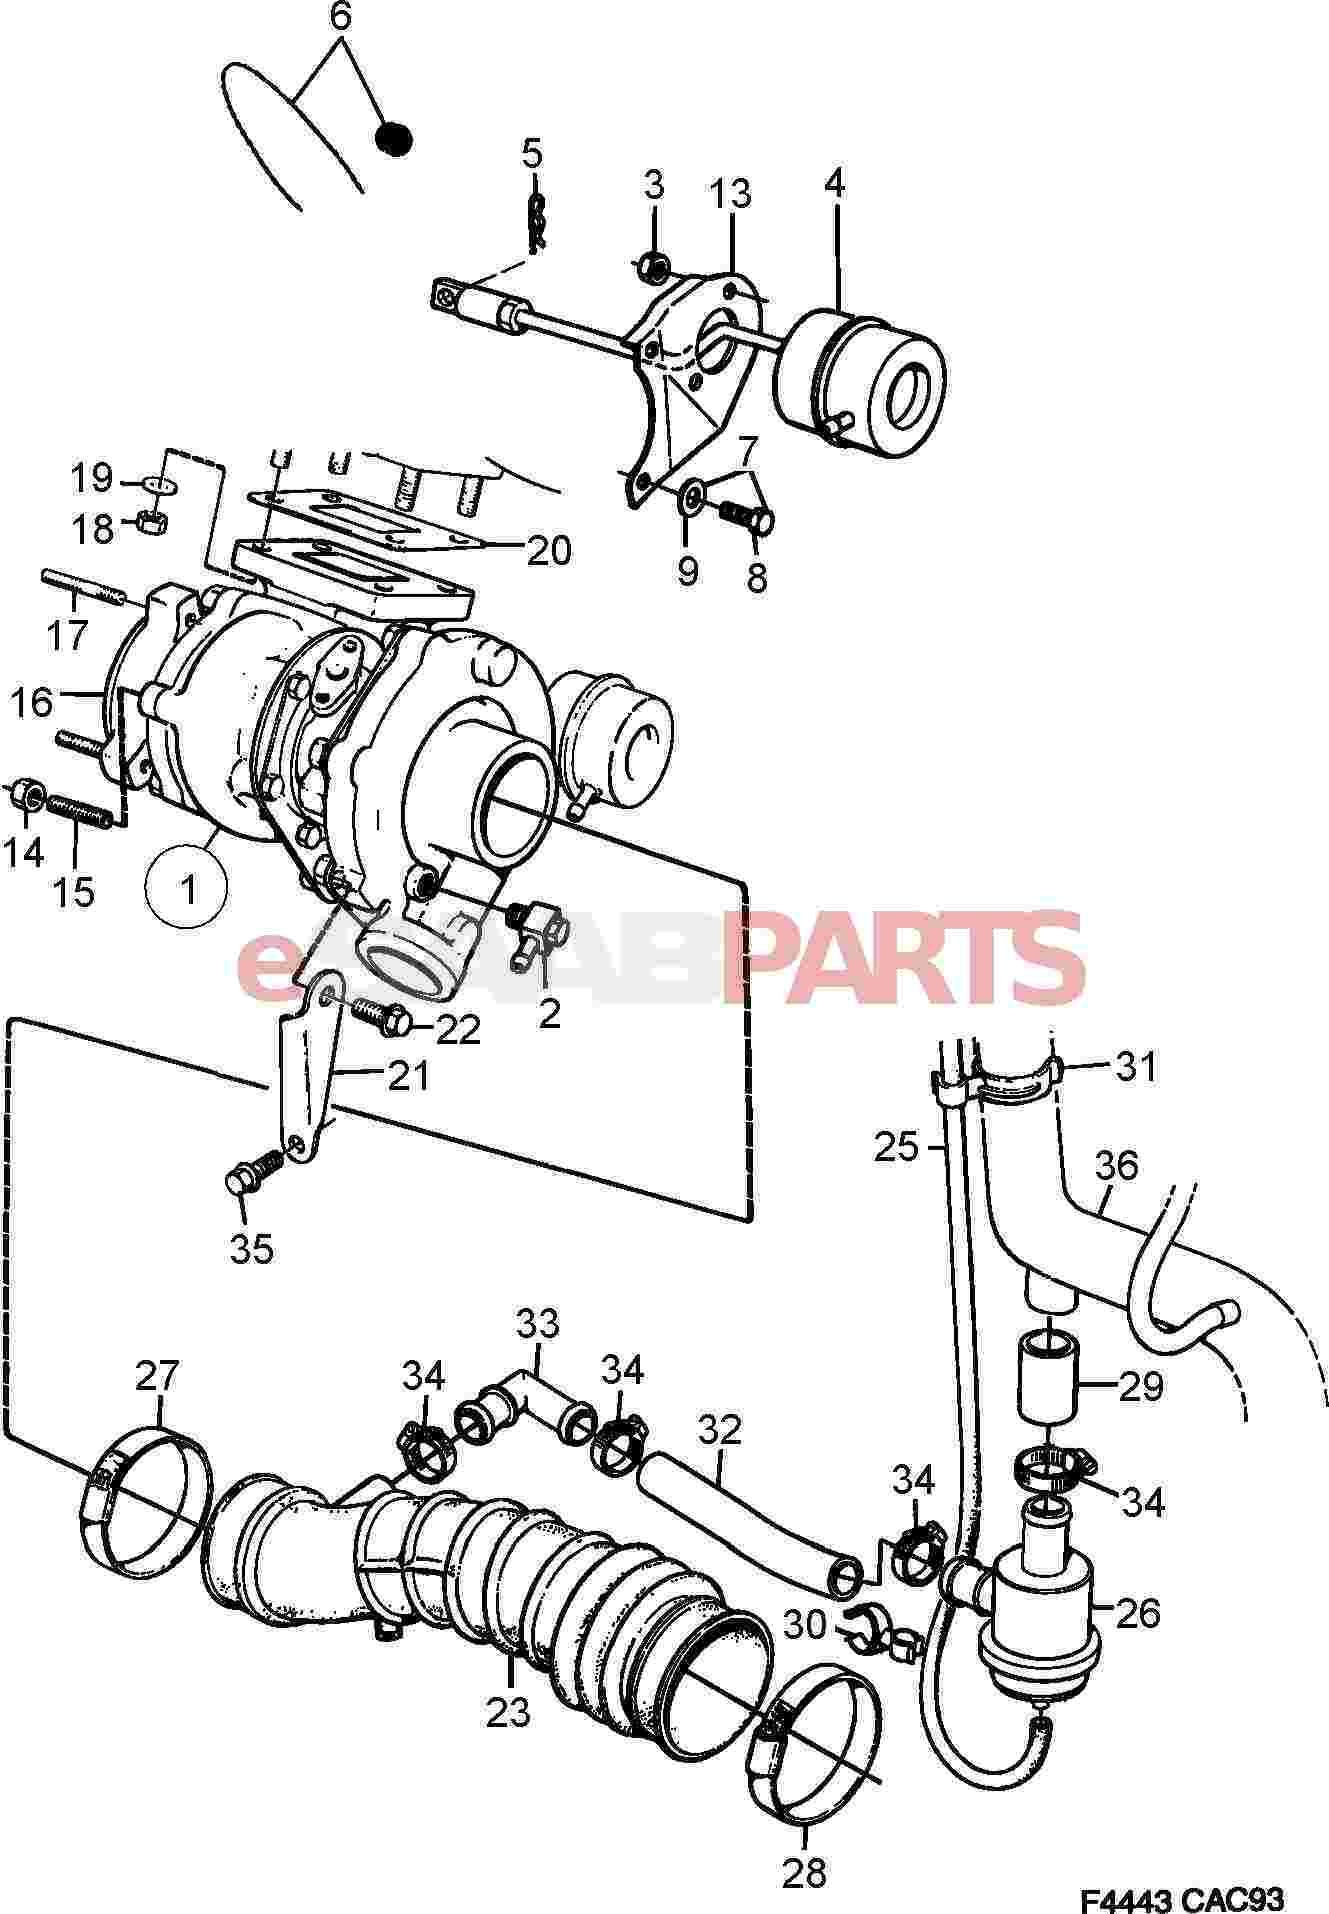 9136243 Saab Vacuum Hose Genuine Parts From 134 F Head Engine Diagram Image